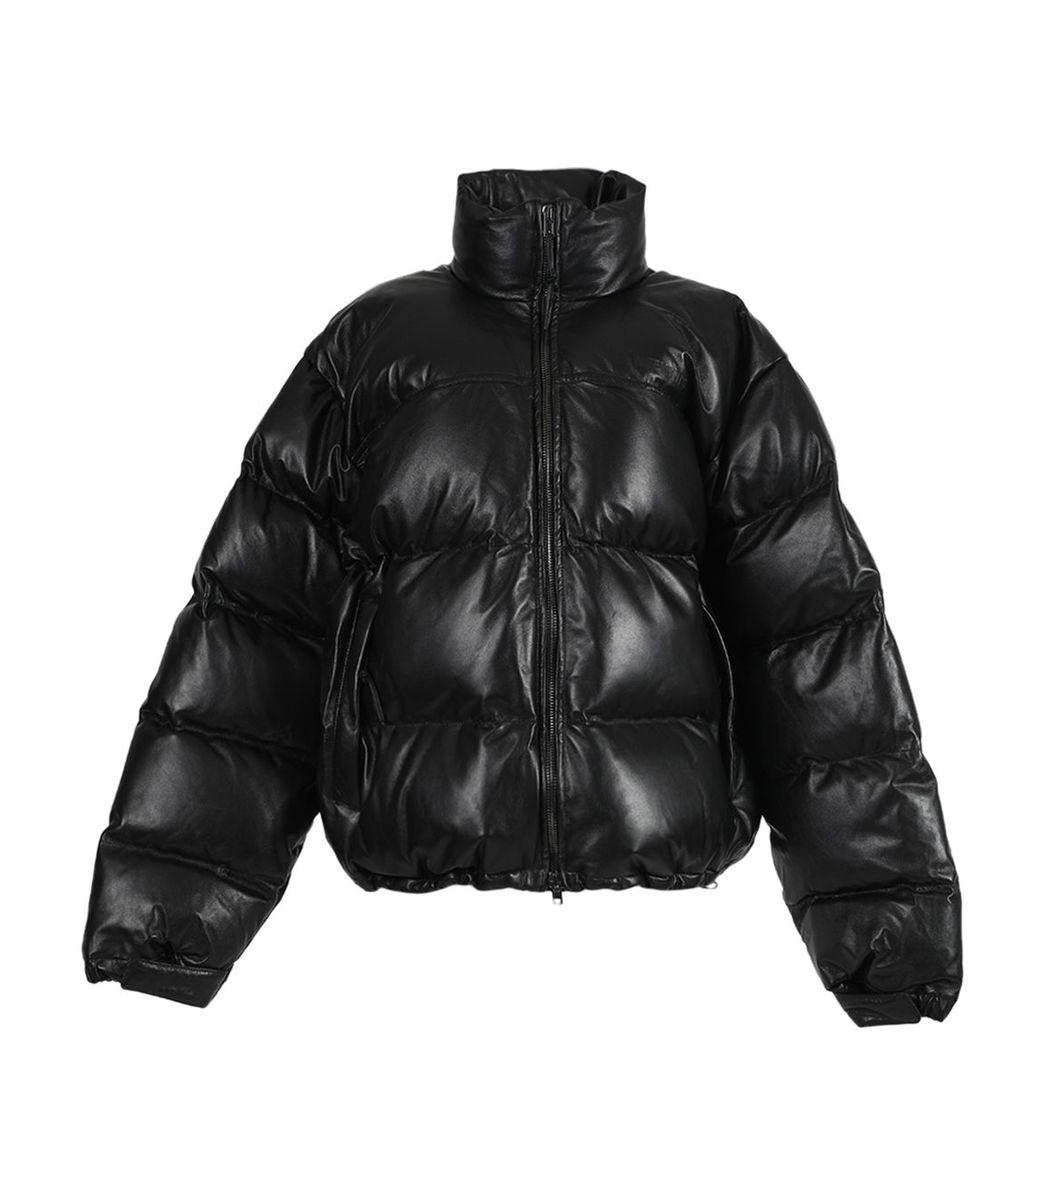 Vetements Black Leather Lambskin Jacket